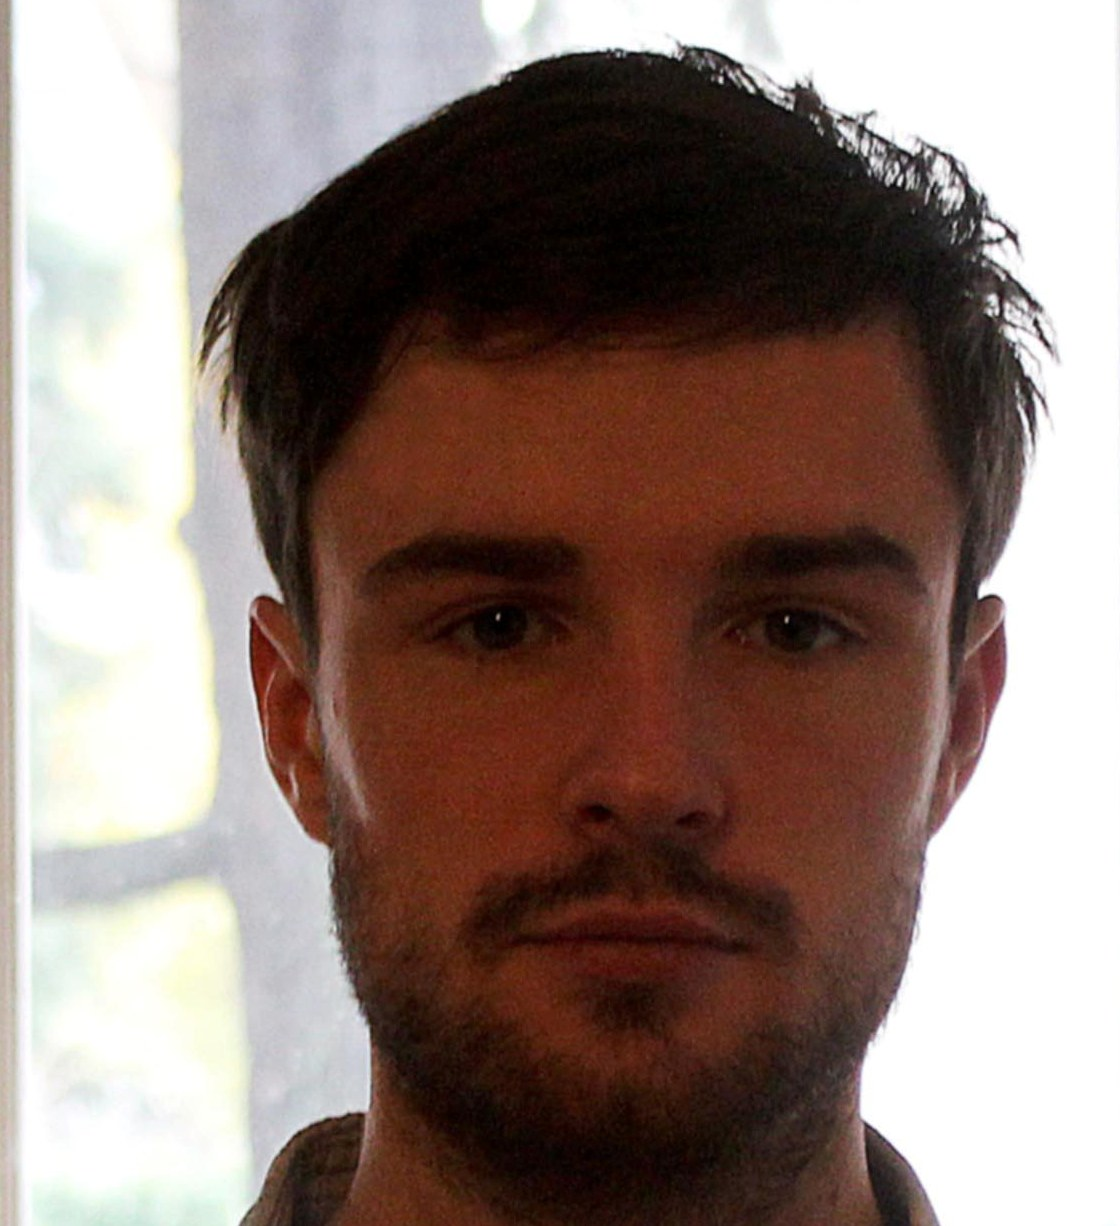 Matthias Ferrino